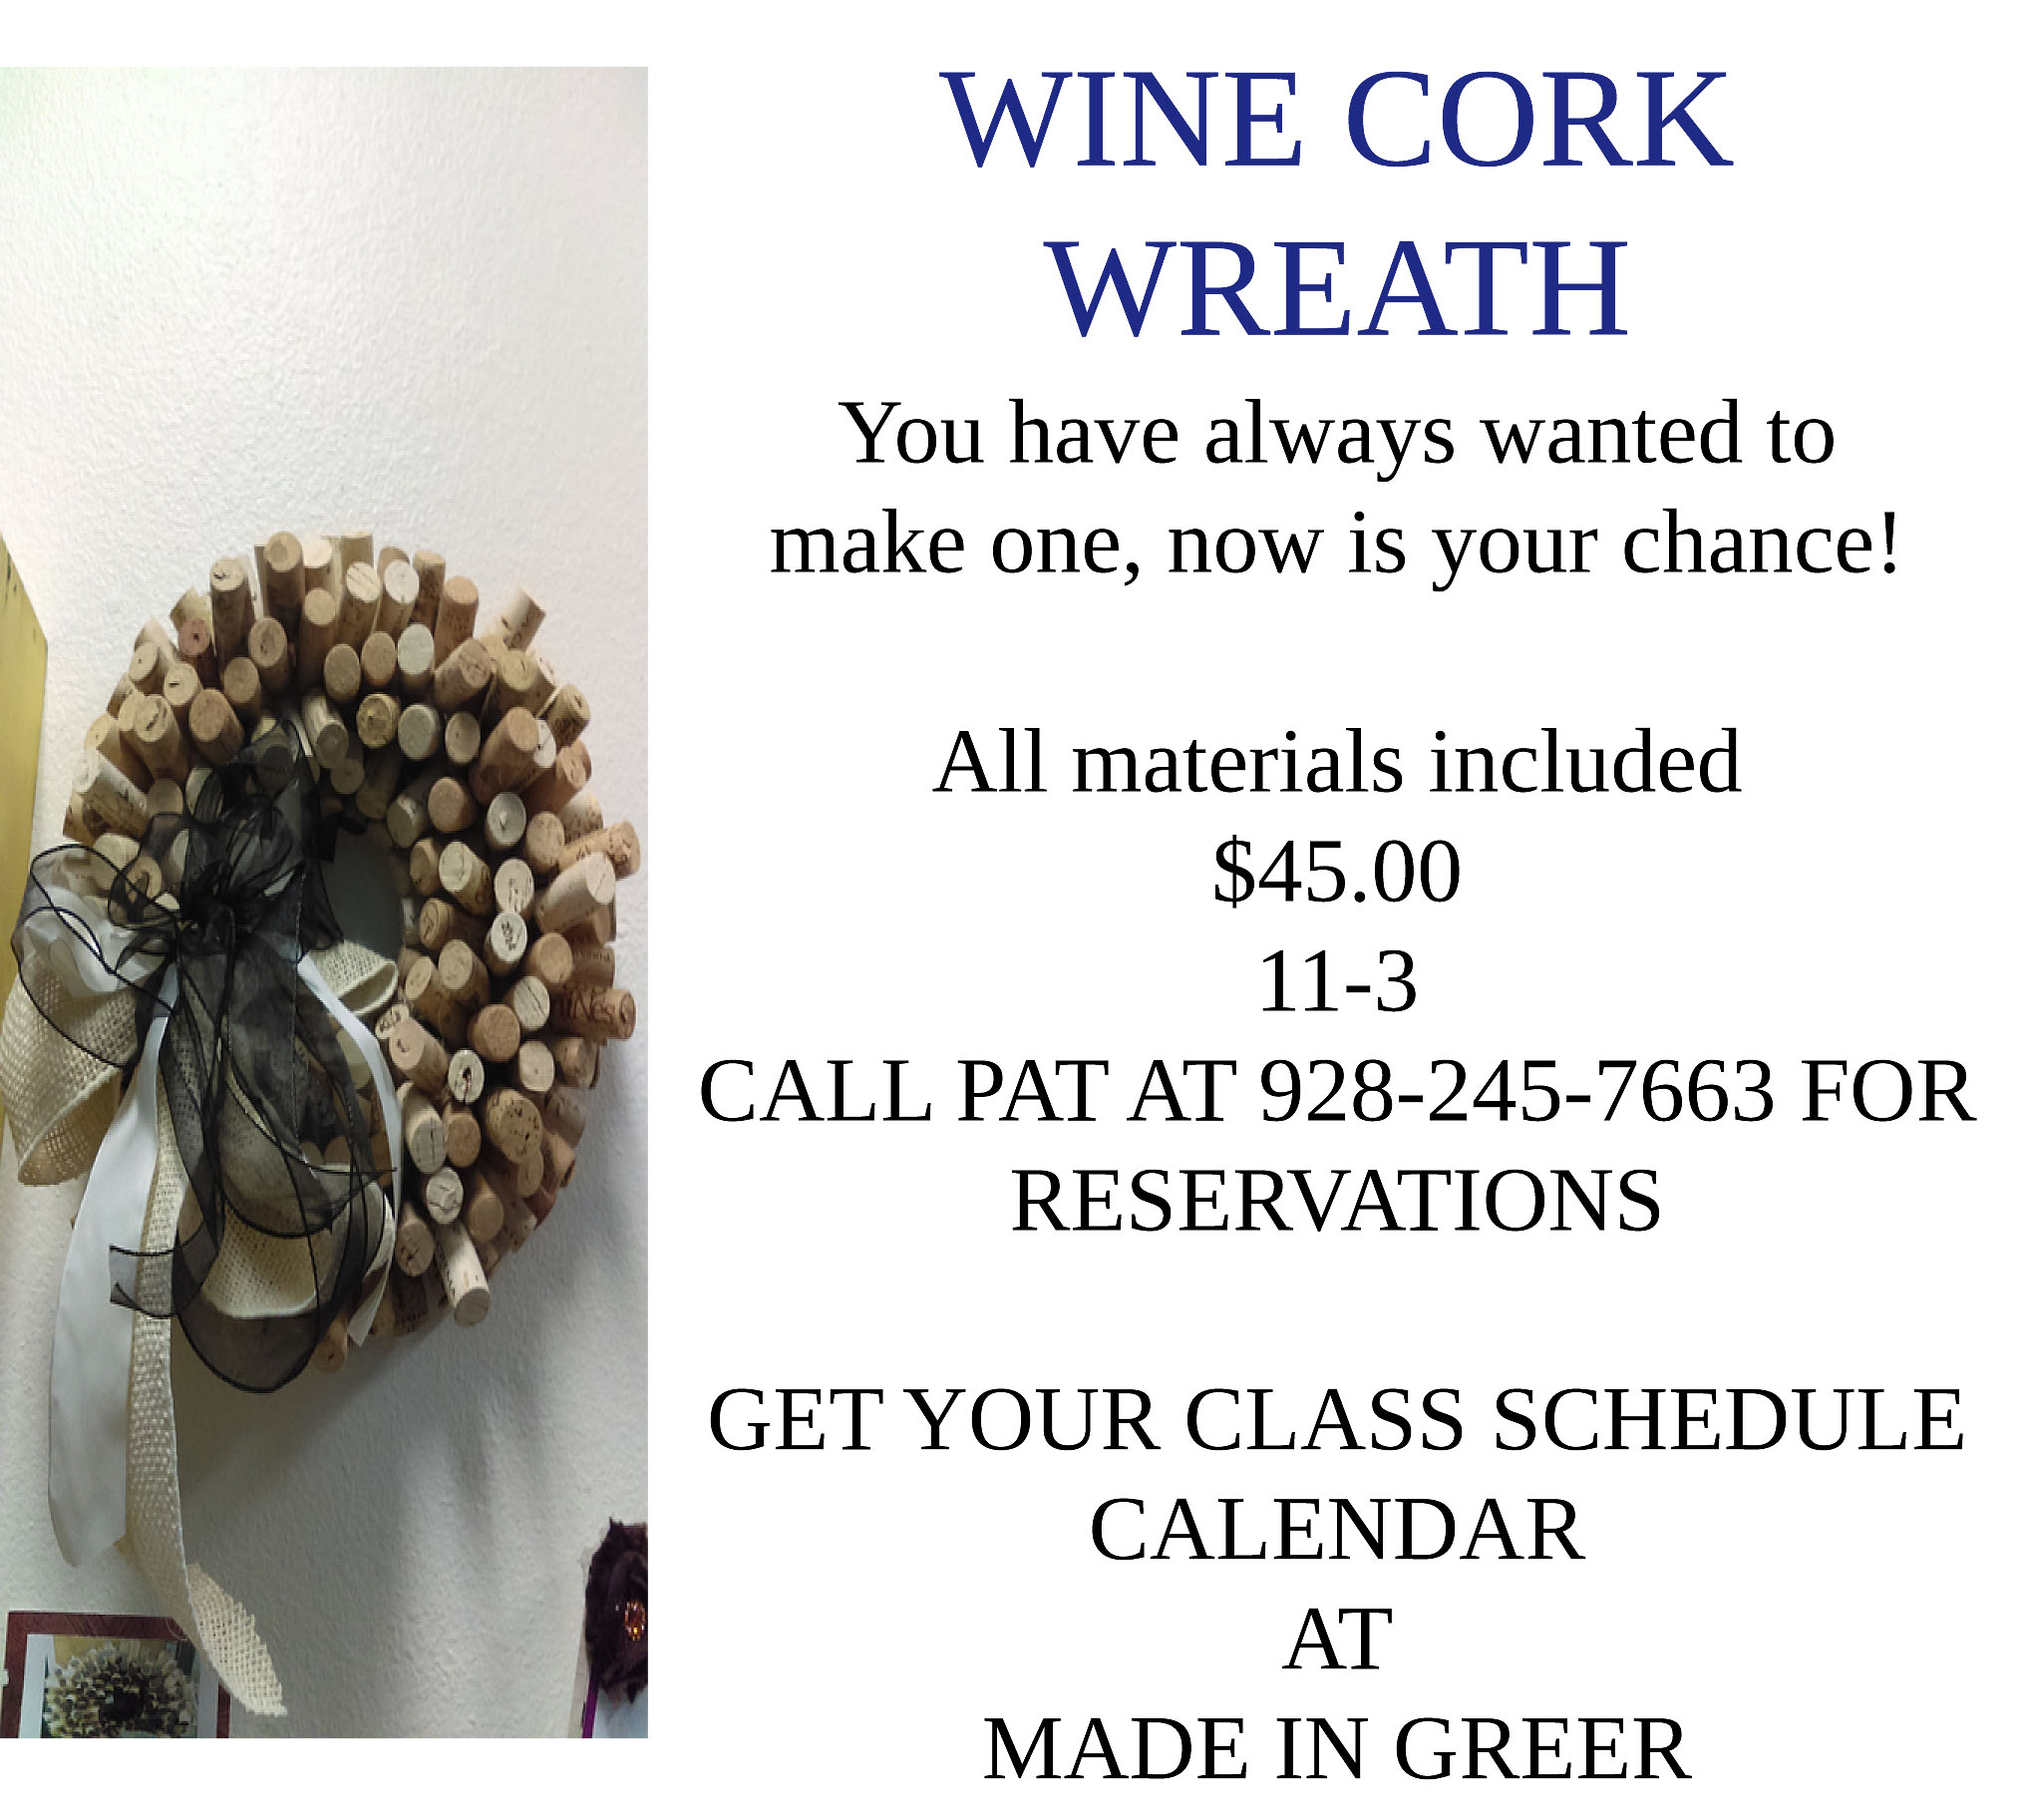 Wine Cork Wreath Class